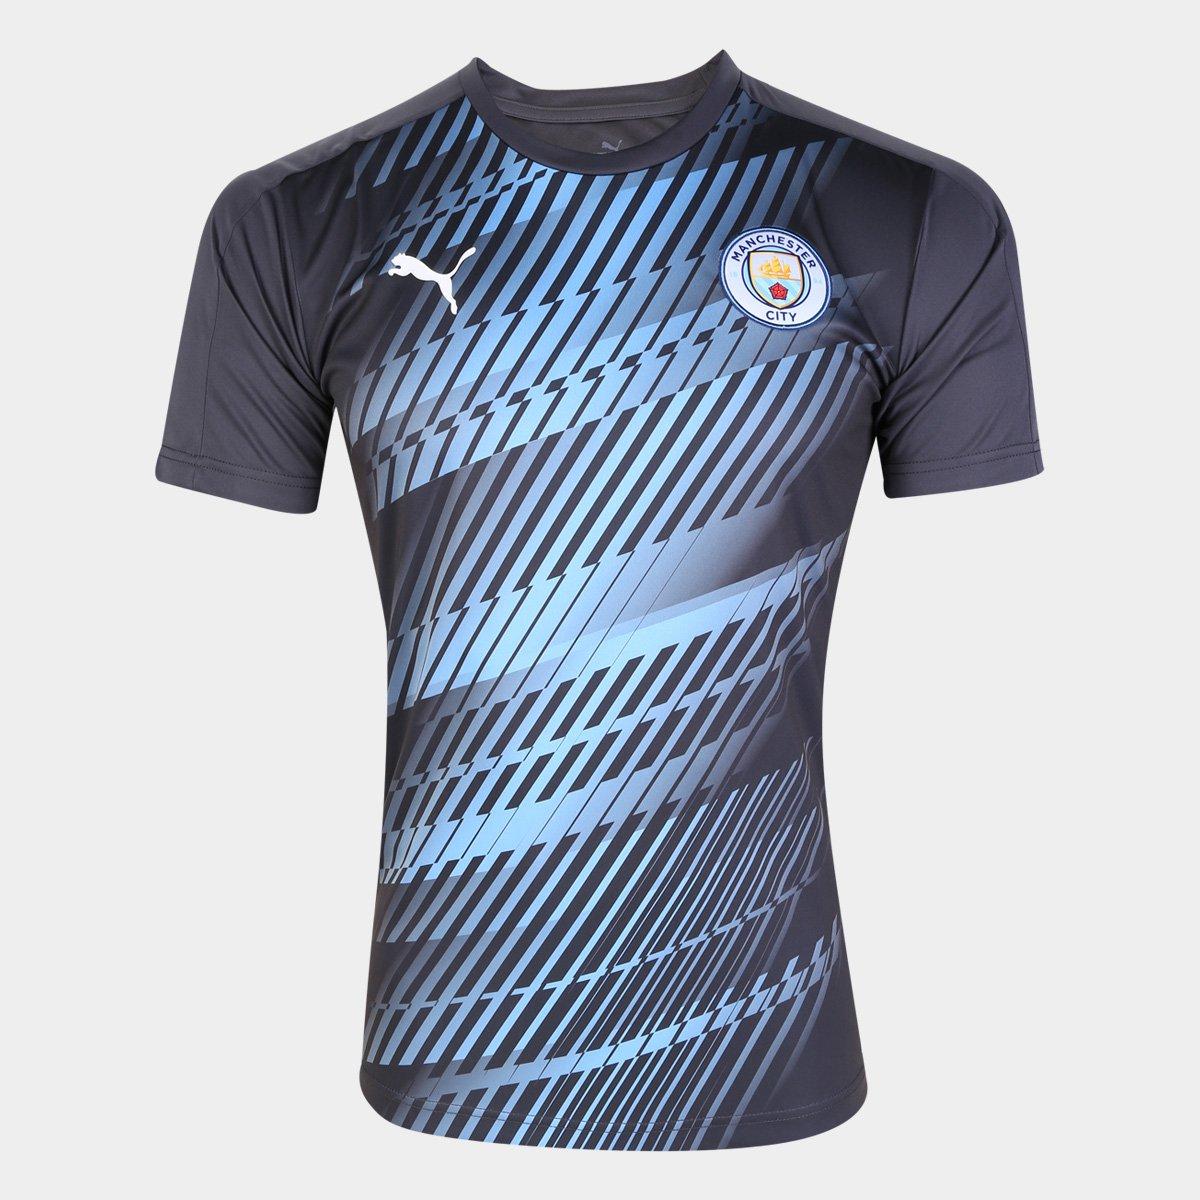 Tranvía kiwi Adolescente  Camisa Manchester City Puma Stadium Masculina | Netshoes